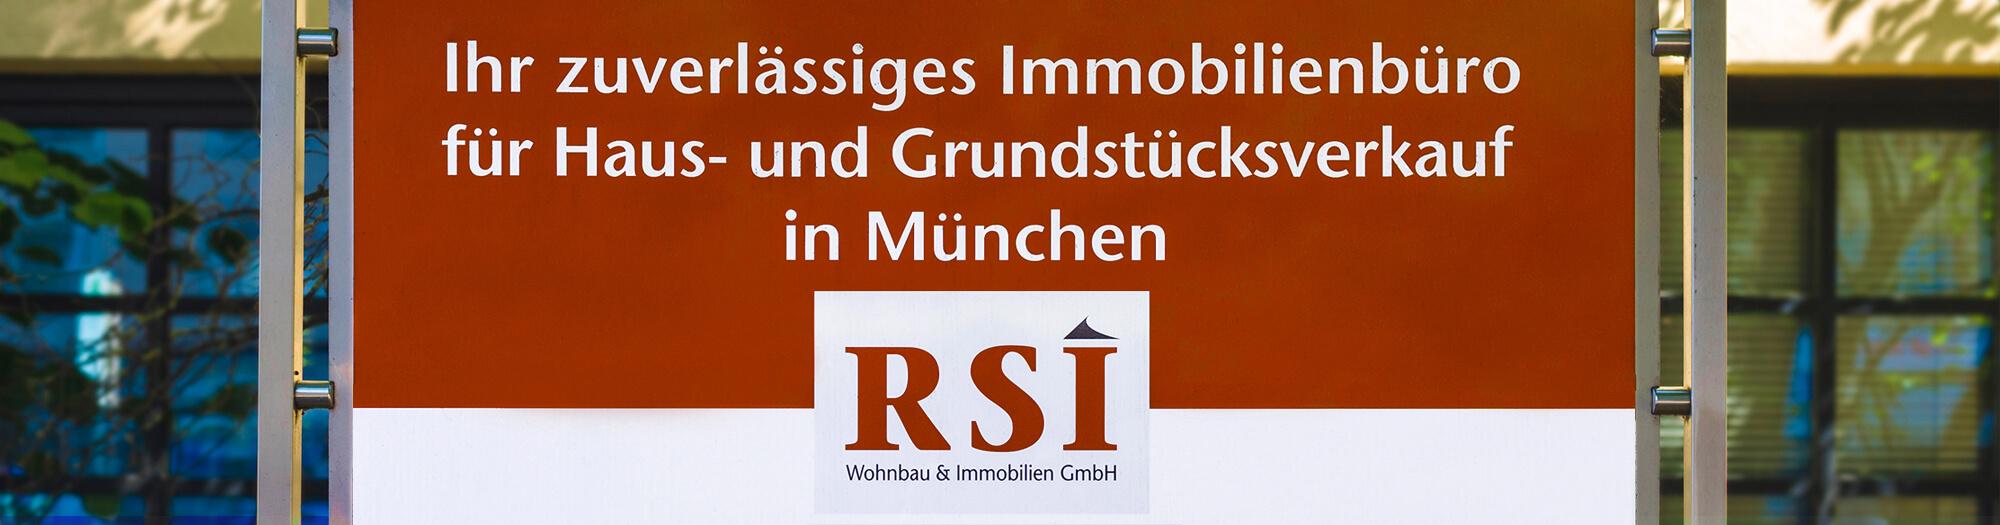 RSI-Firmenschild